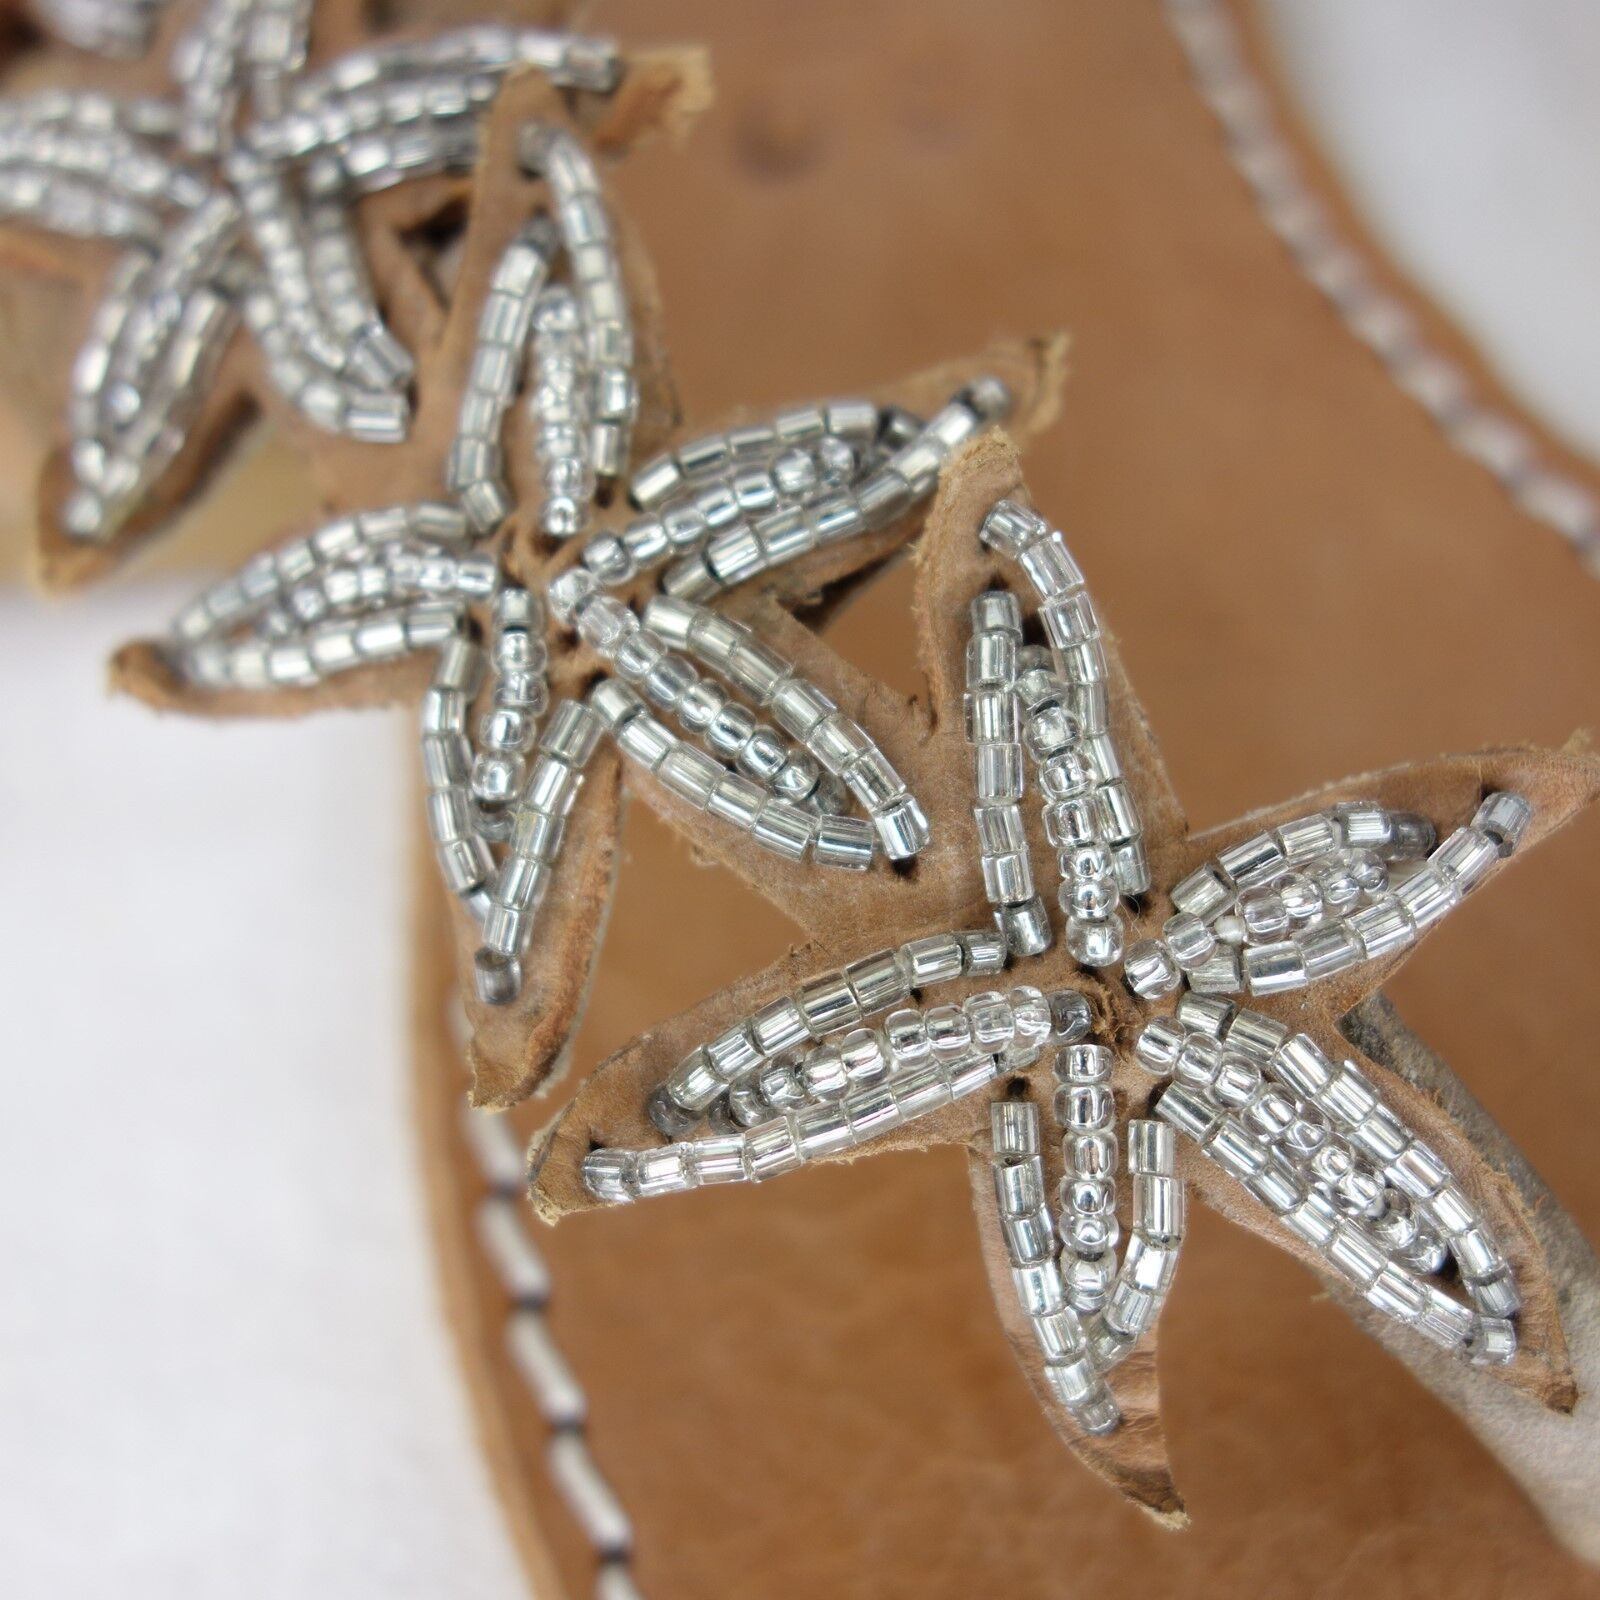 LAIDBACK Stern LONDON Damen Sandalen Zehentrenner Schuhe 36 37 Leder Stern LAIDBACK NEU 69 NP 1bc2bd